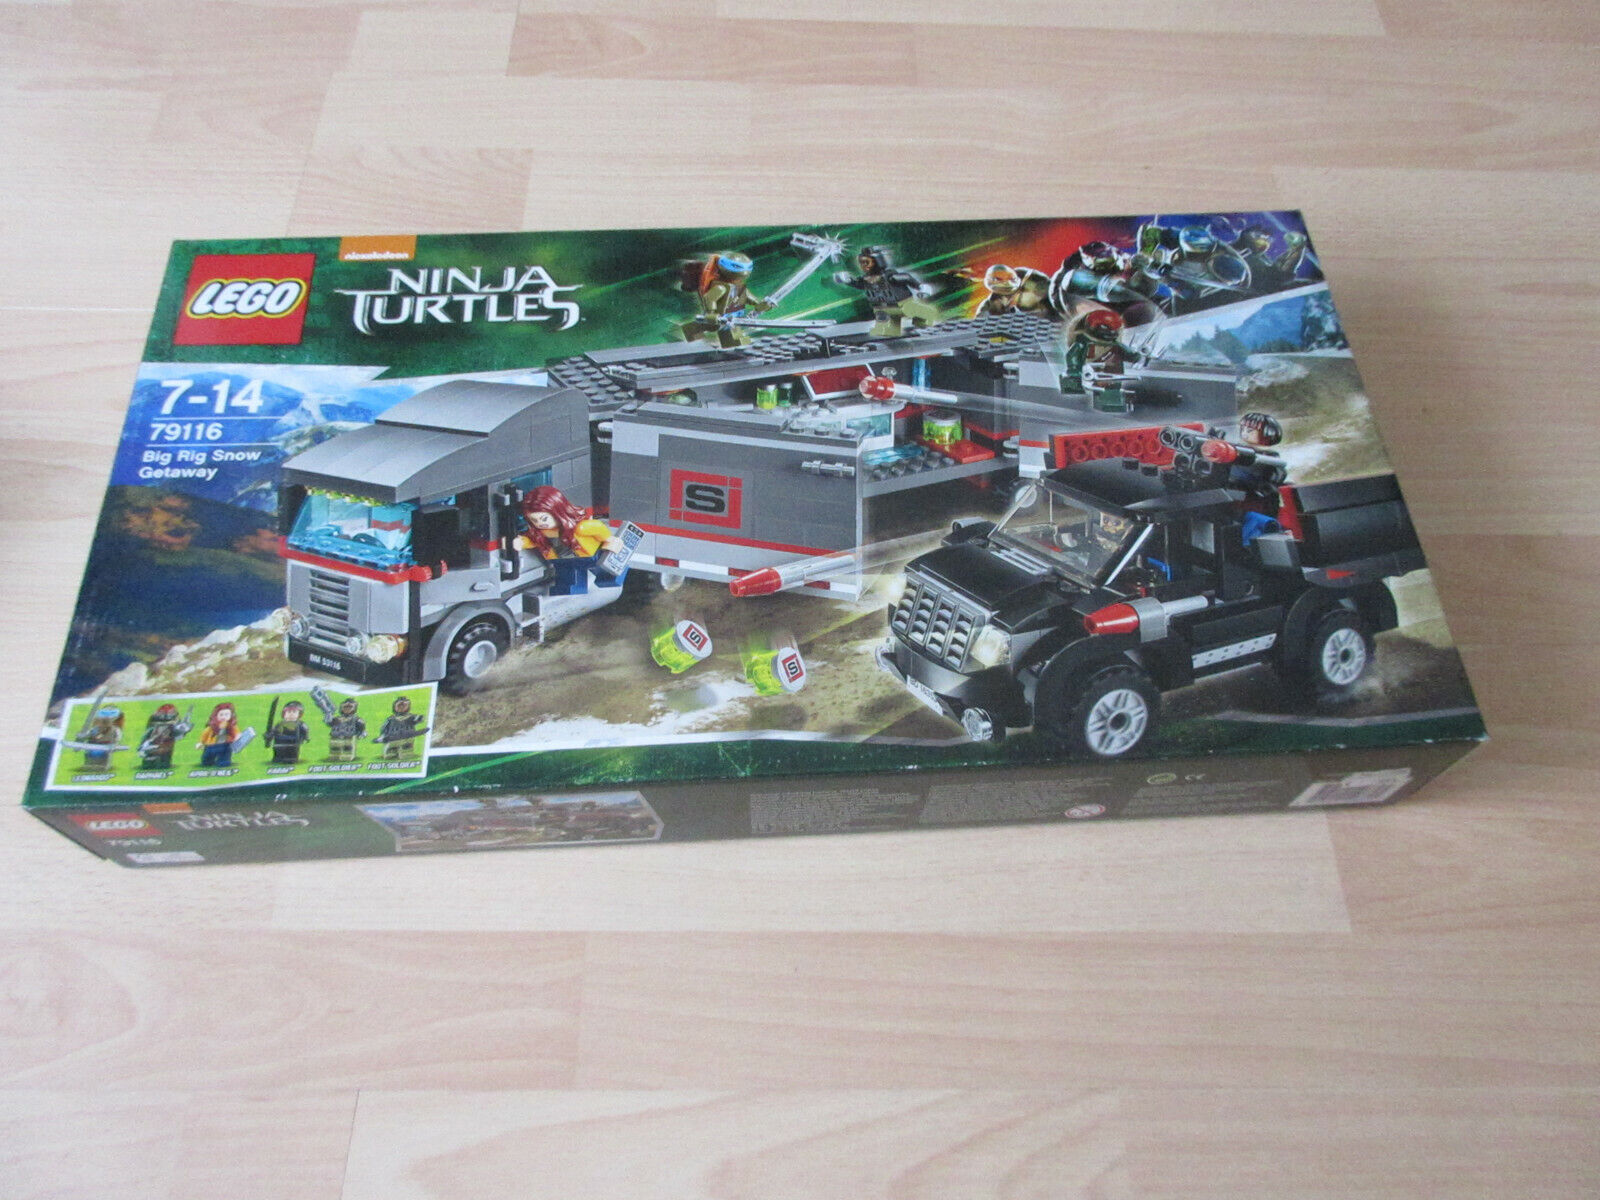 Lego Ninja Turtles (movie) 79116 Big Rig snow Getaway nuevo embalaje original &